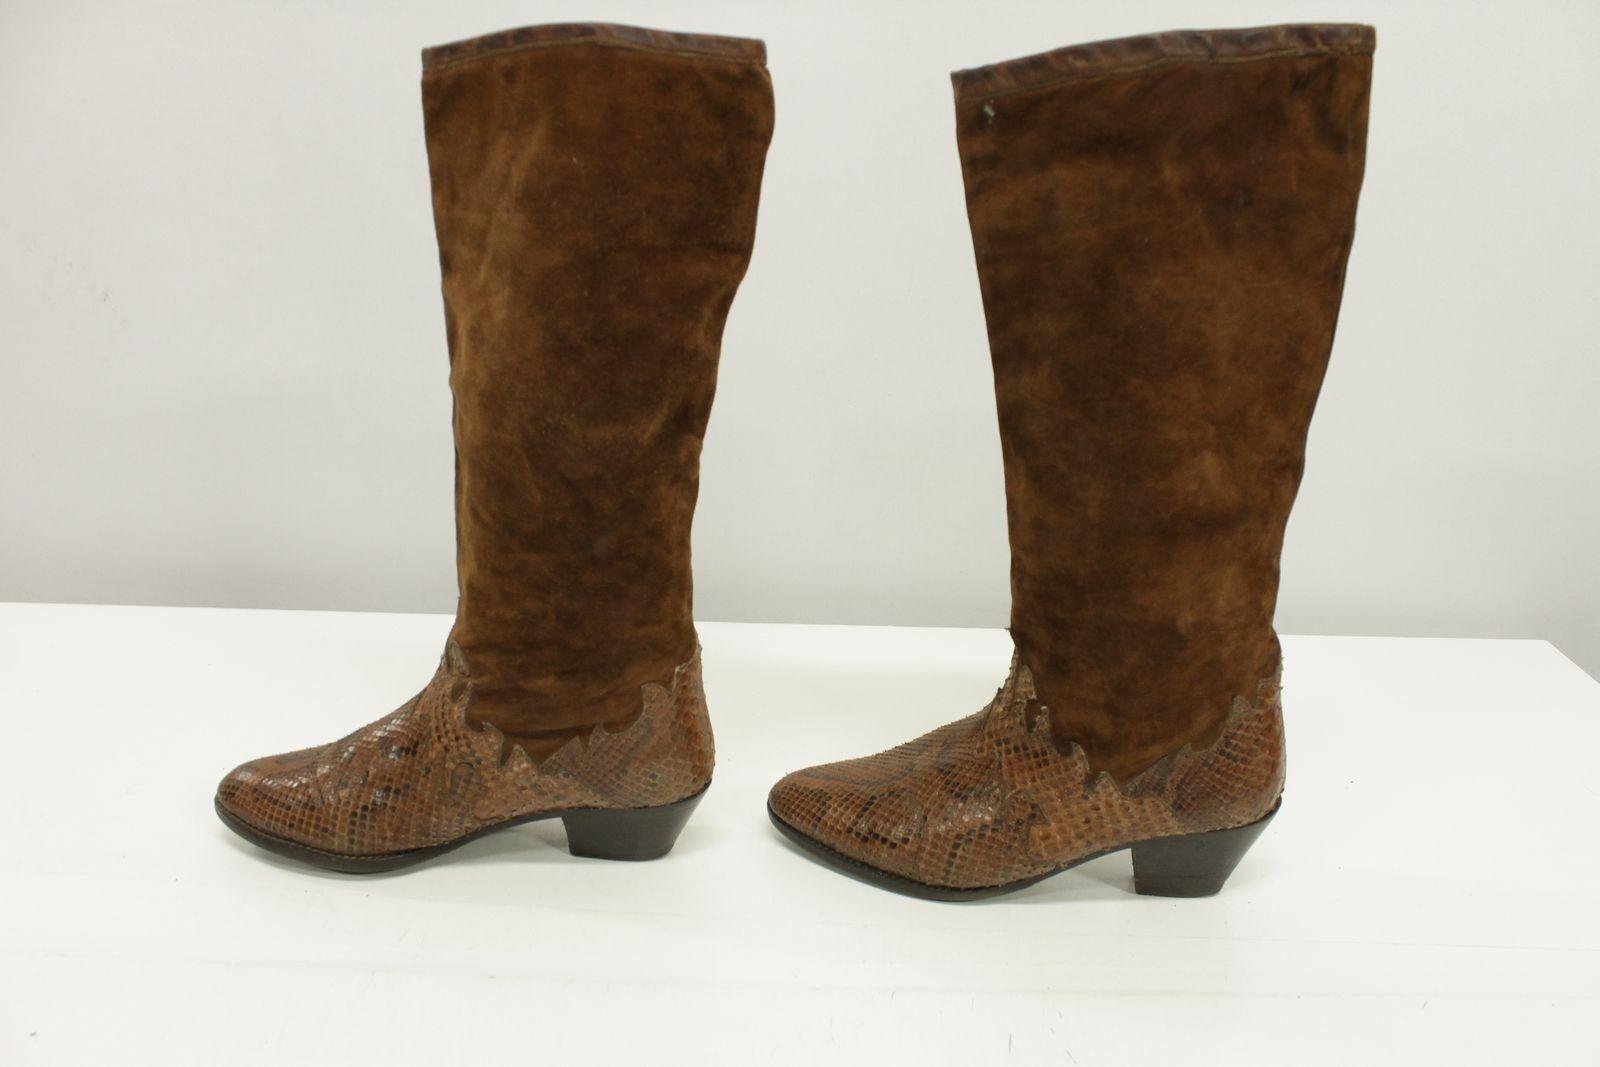 Botas Nando Muzzi boots (Cod.ST743) cowboys camperos western usado mujer